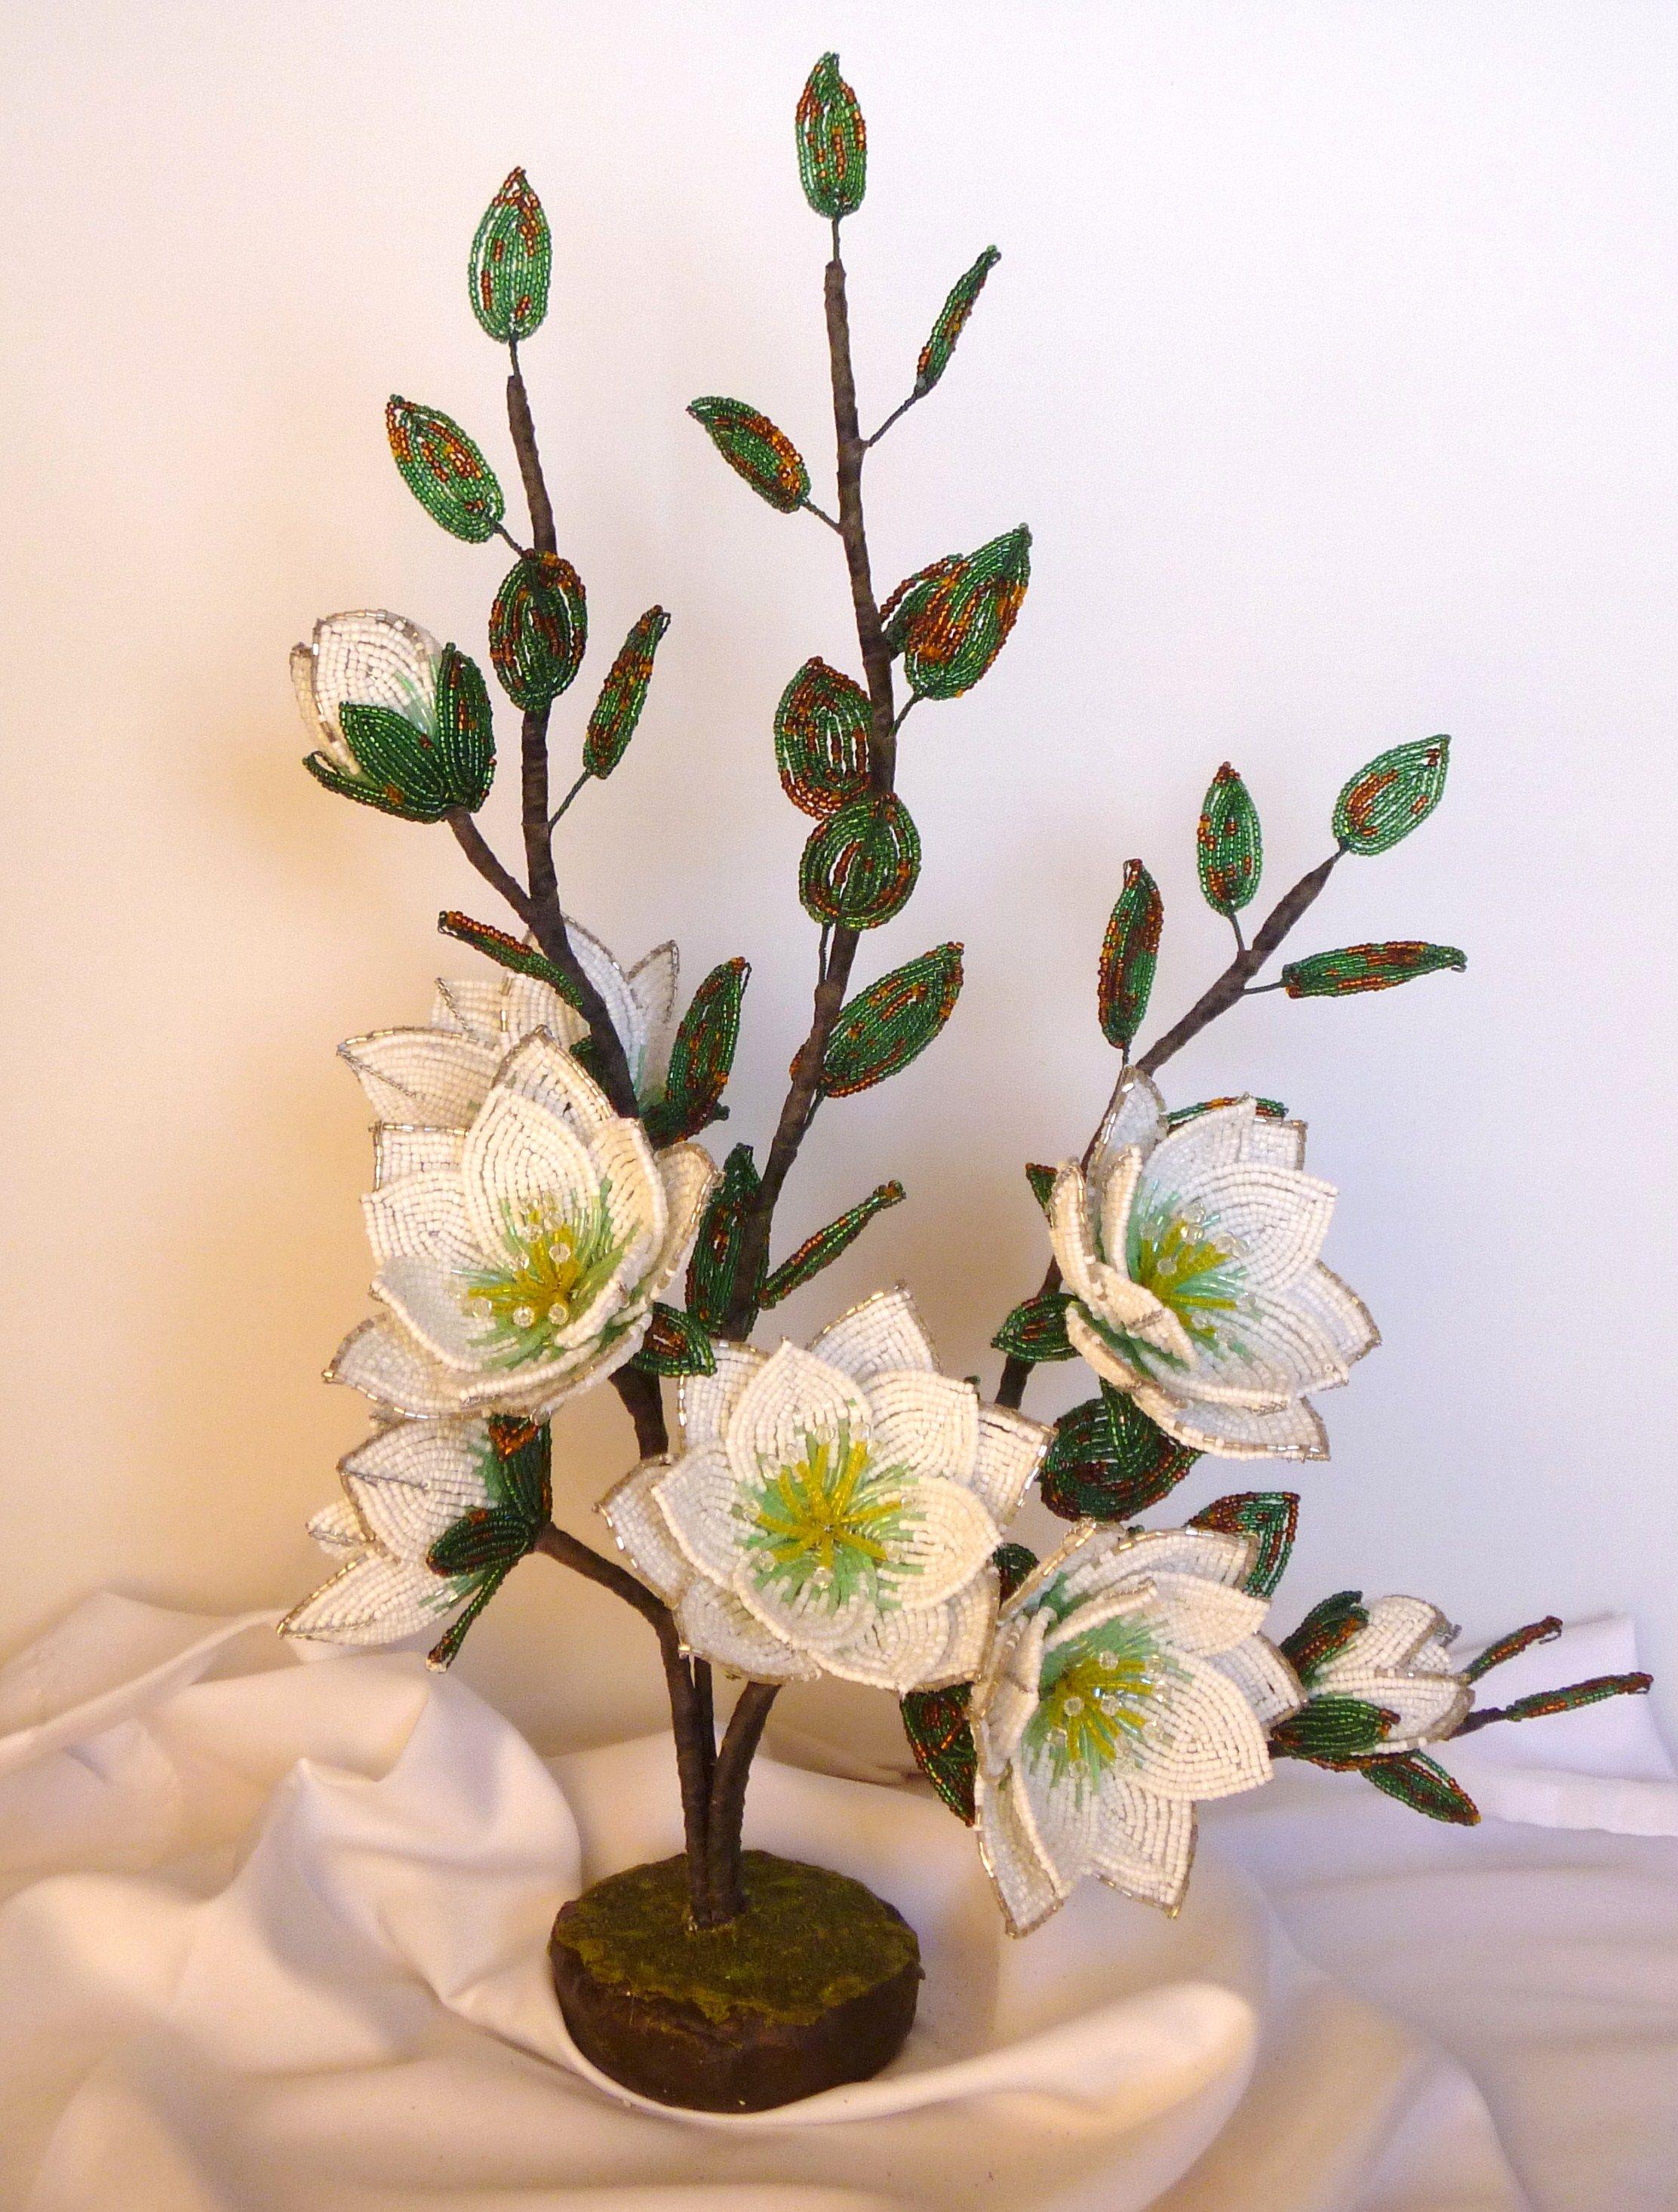 Цветы на коряге из бисера, фоамирана